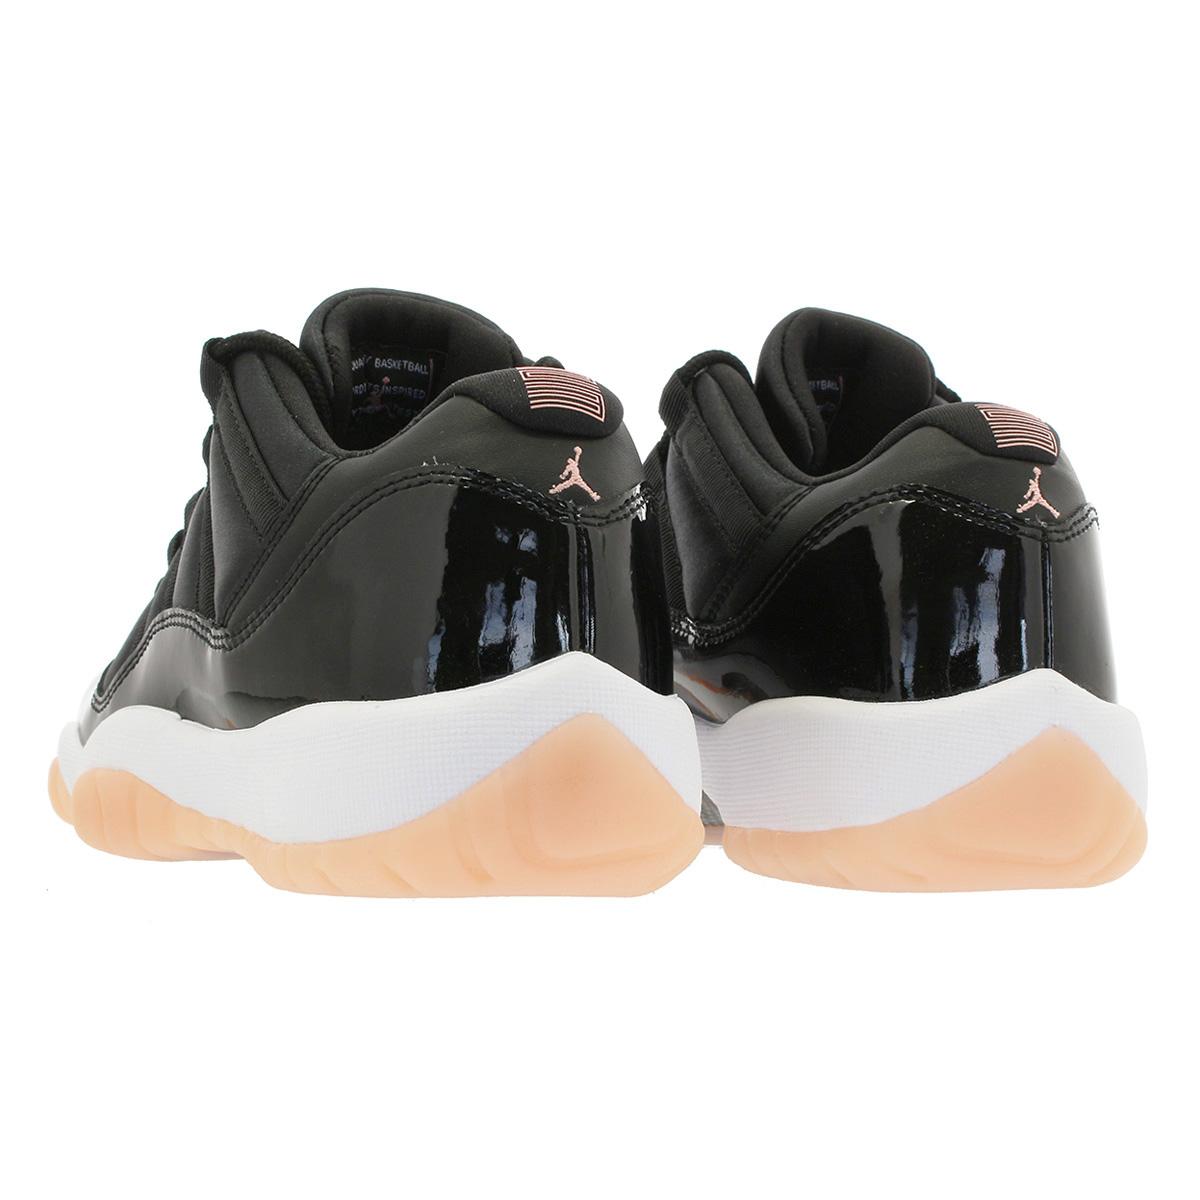 73cfe8f881c3 NIKE AIR JORDAN 11 RETRO LOW GG Nike Air Jordan 11 nostalgic low BG BLACK BLEACHED  CORAL WHITE 580